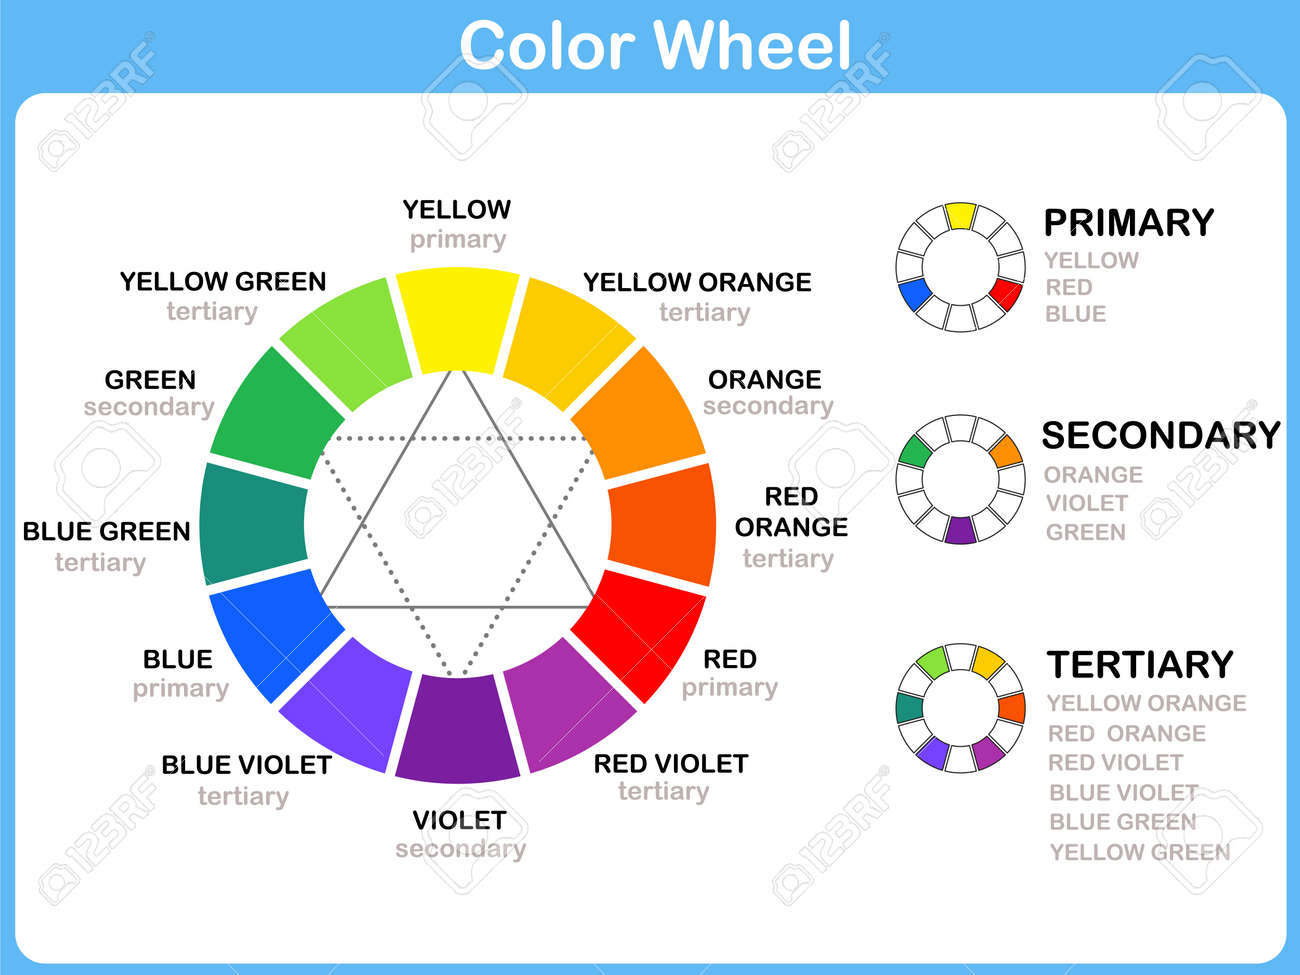 Color Wheel Worksheet Red Blue Yellow Color For Kids Royalty – Color Wheel Worksheet